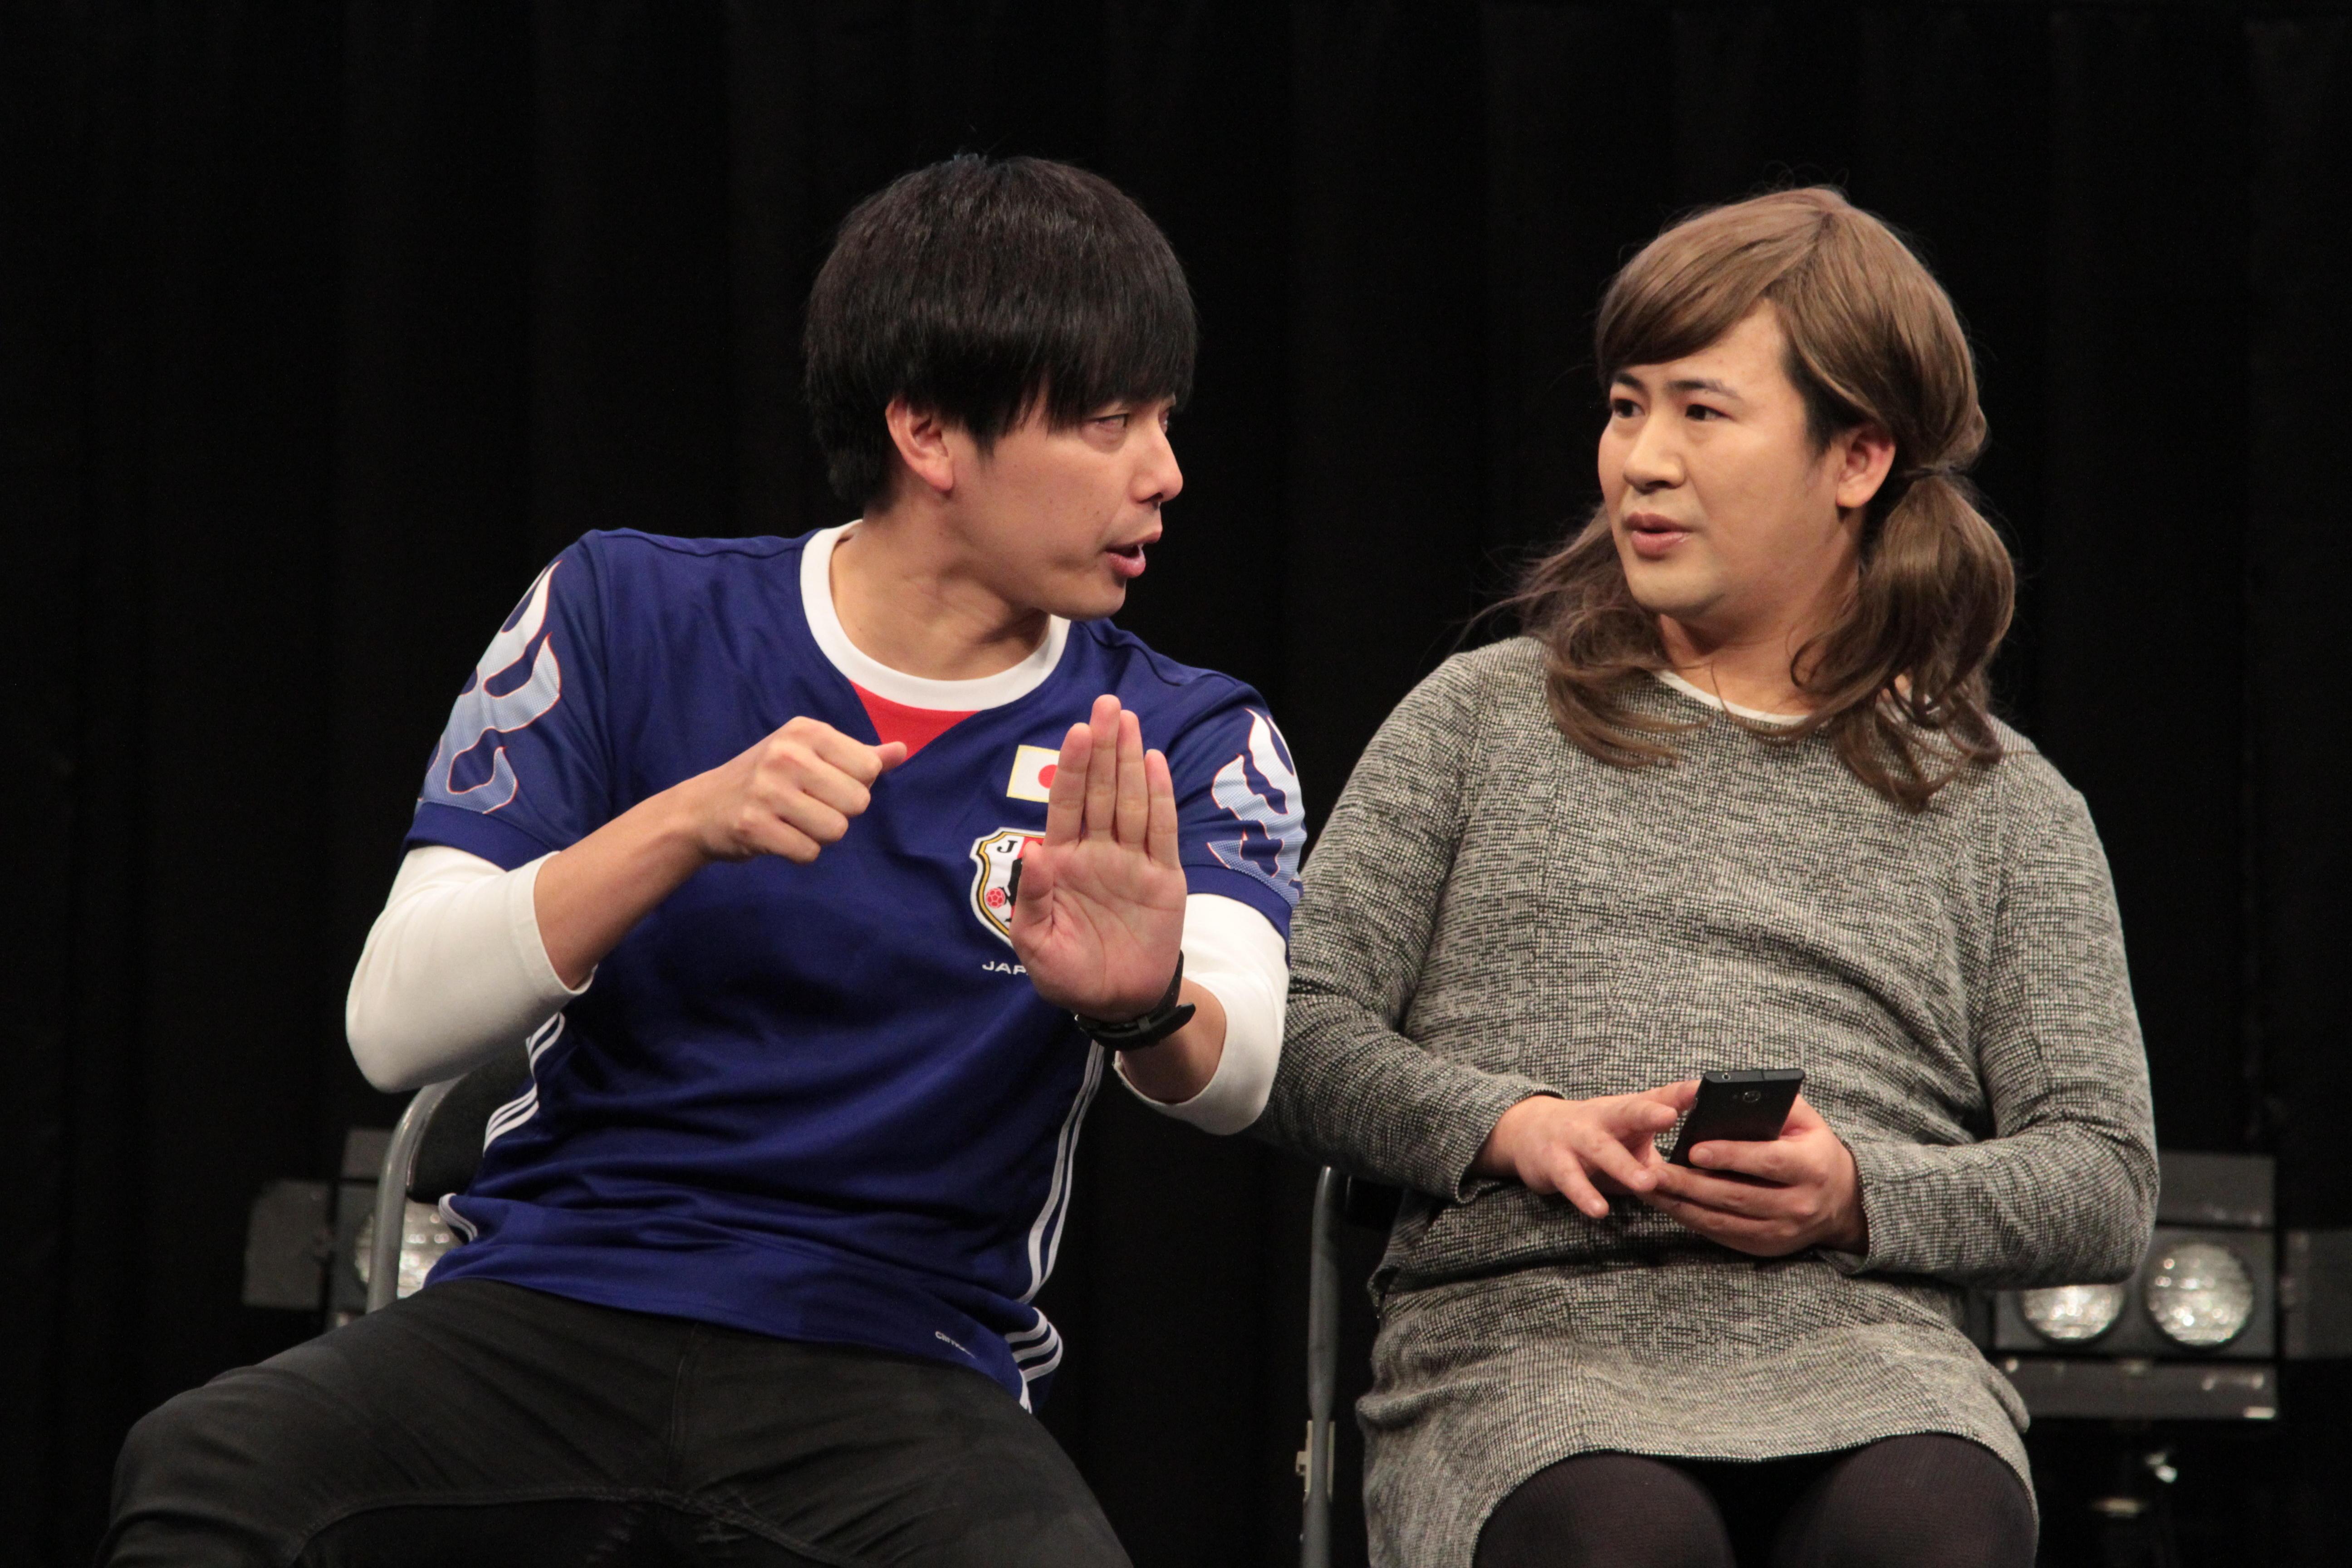 http://news.yoshimoto.co.jp/20190107131748-ec4e558c34aa04a891087332840240e878e4d4d8.jpg